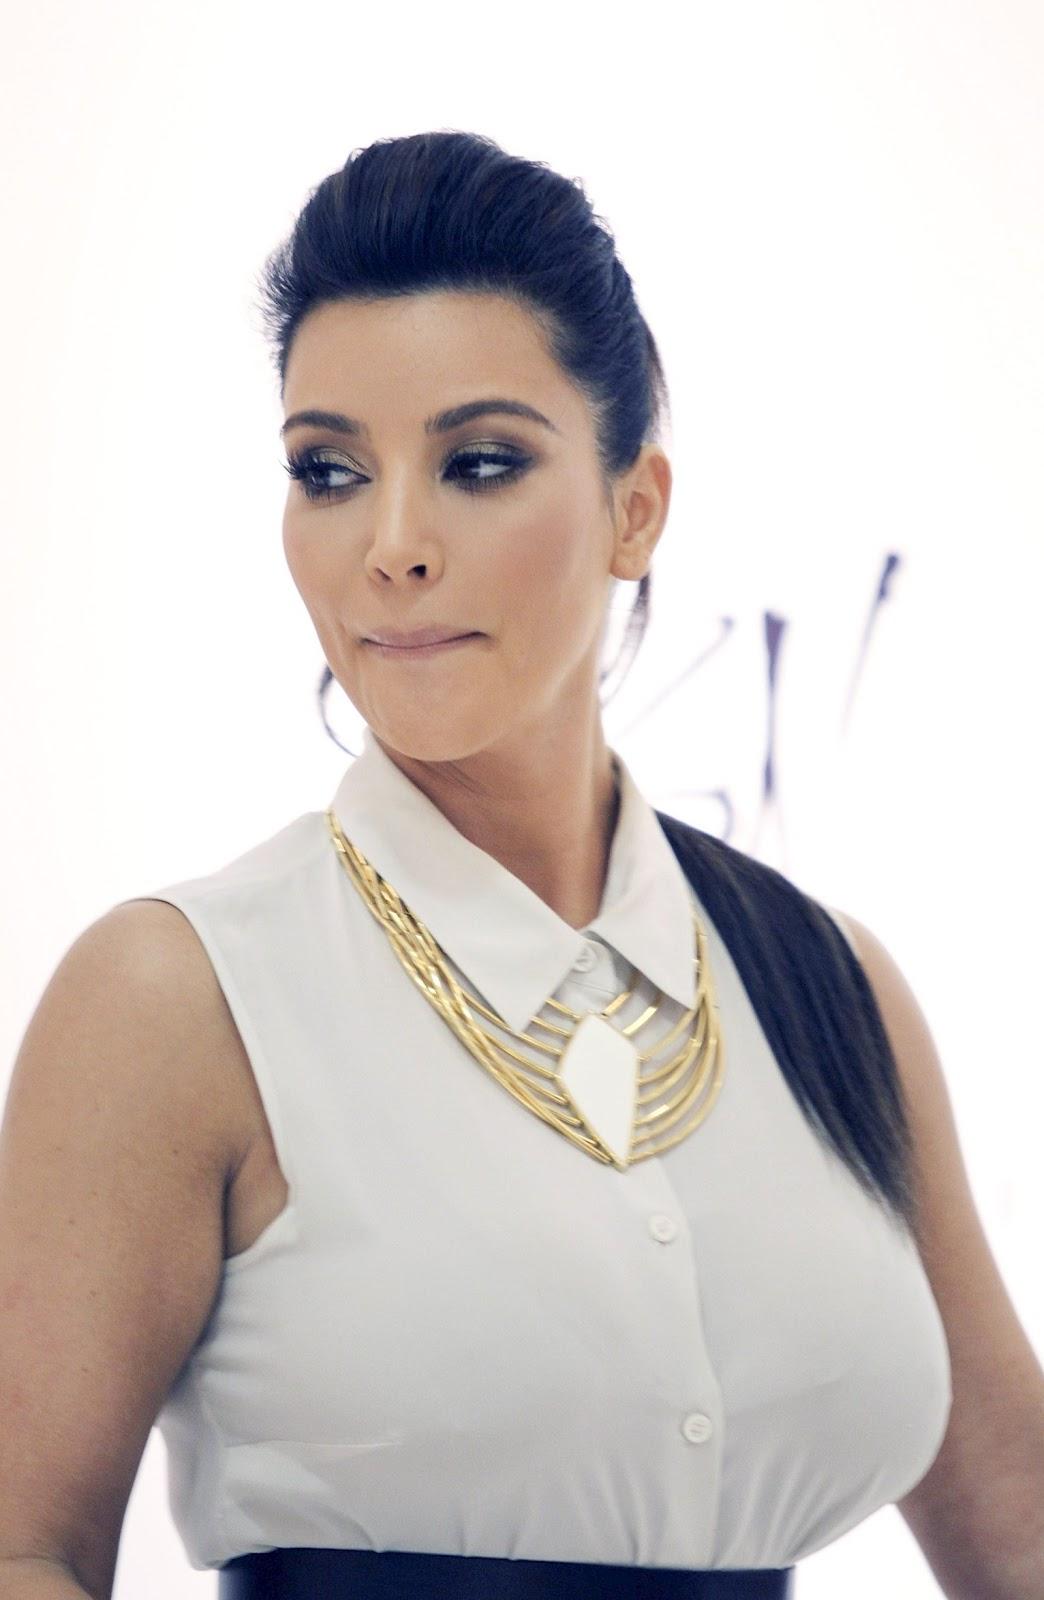 http://2.bp.blogspot.com/-cnN7KNDZqqU/T610QCnMPmI/AAAAAAAAE48/FZcbhLrnFvg/s1600/Kim+Kardashian-Belle+Noel+Jewelry-Promotion-Toronto-05.jpg